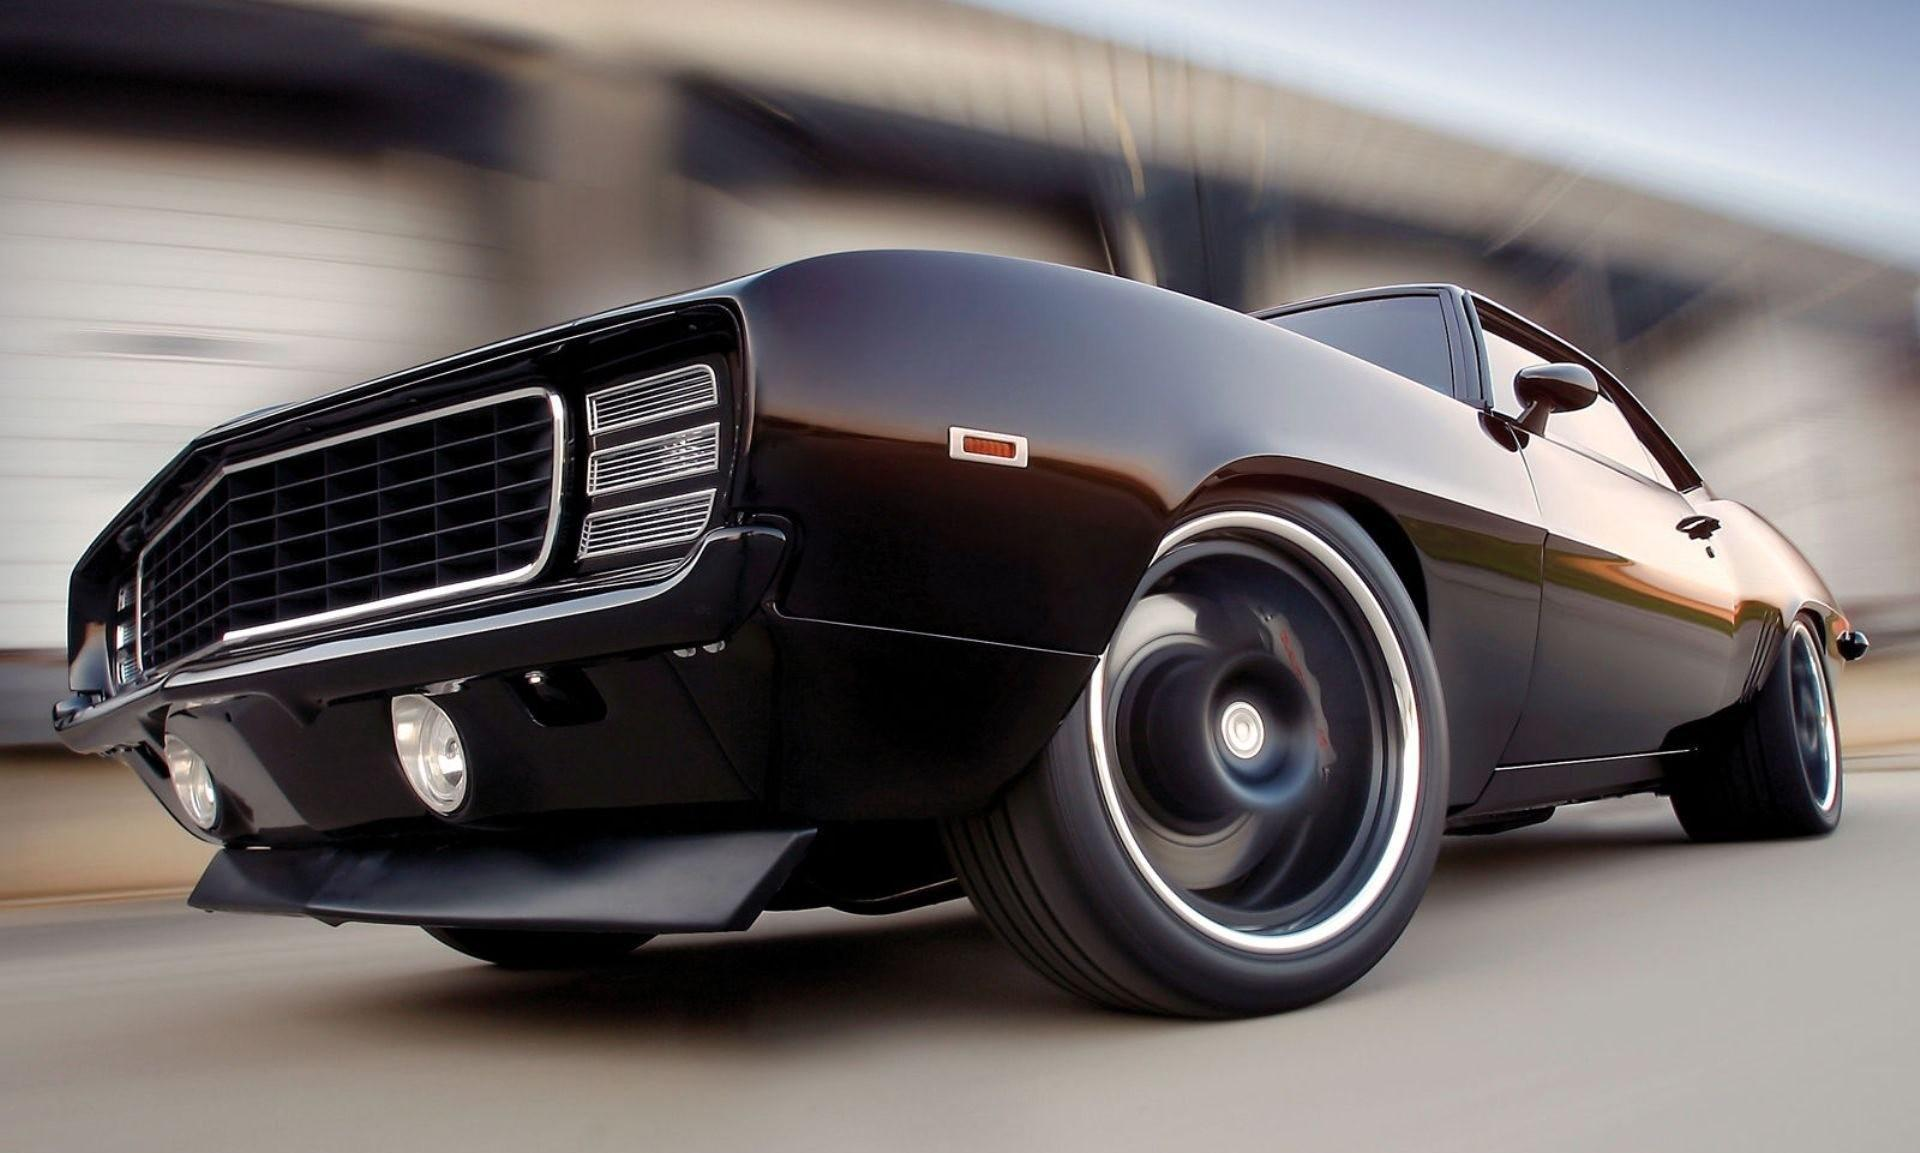 Muscle Cars Com Widescreen Car Custom Caddy Lexus Wallpapers Cars